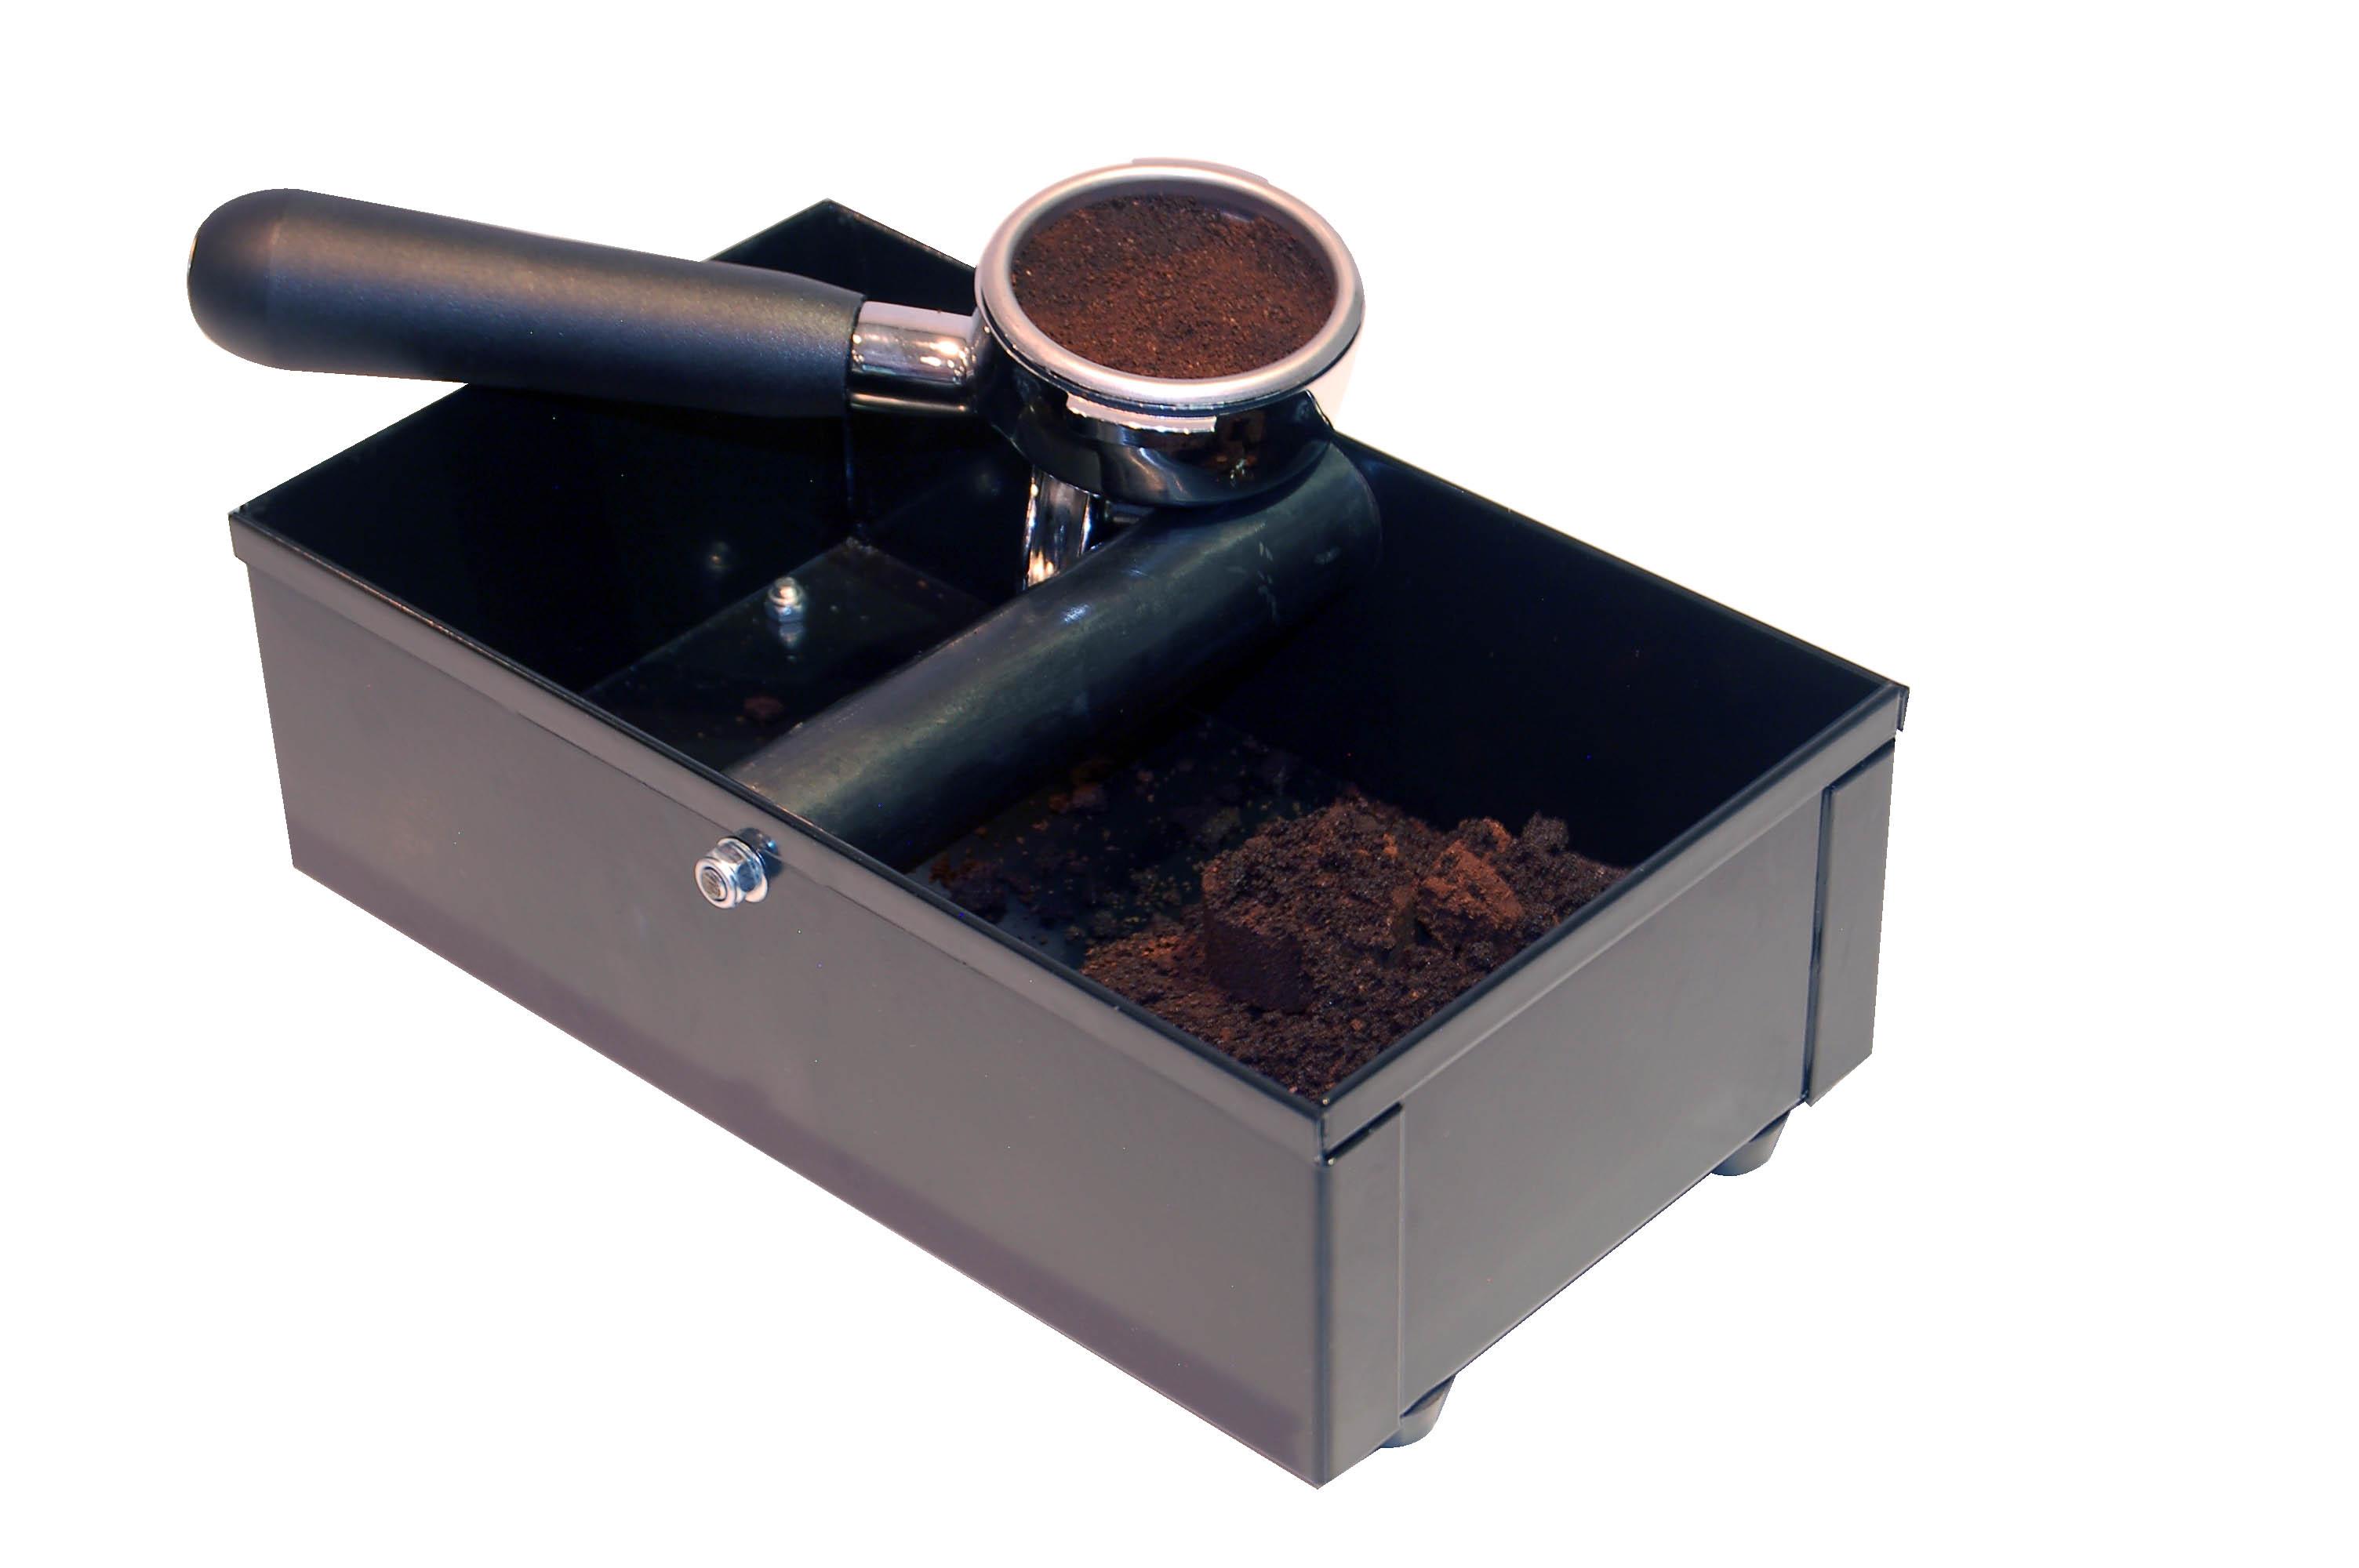 emk0001--espresso-machine--knock-box